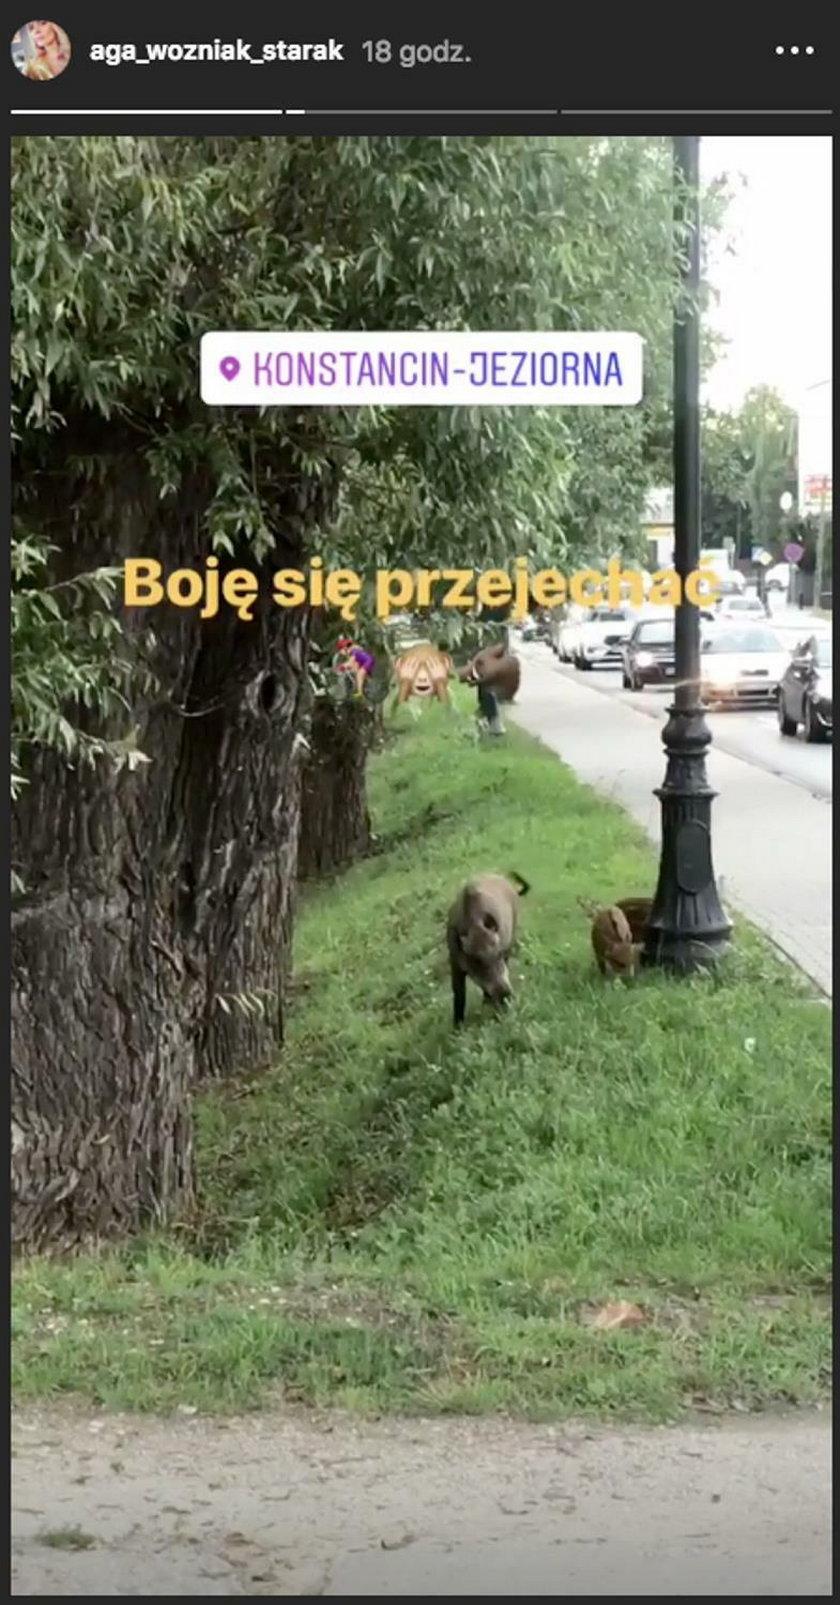 Instastories Agnieszki Woźniak-Starak